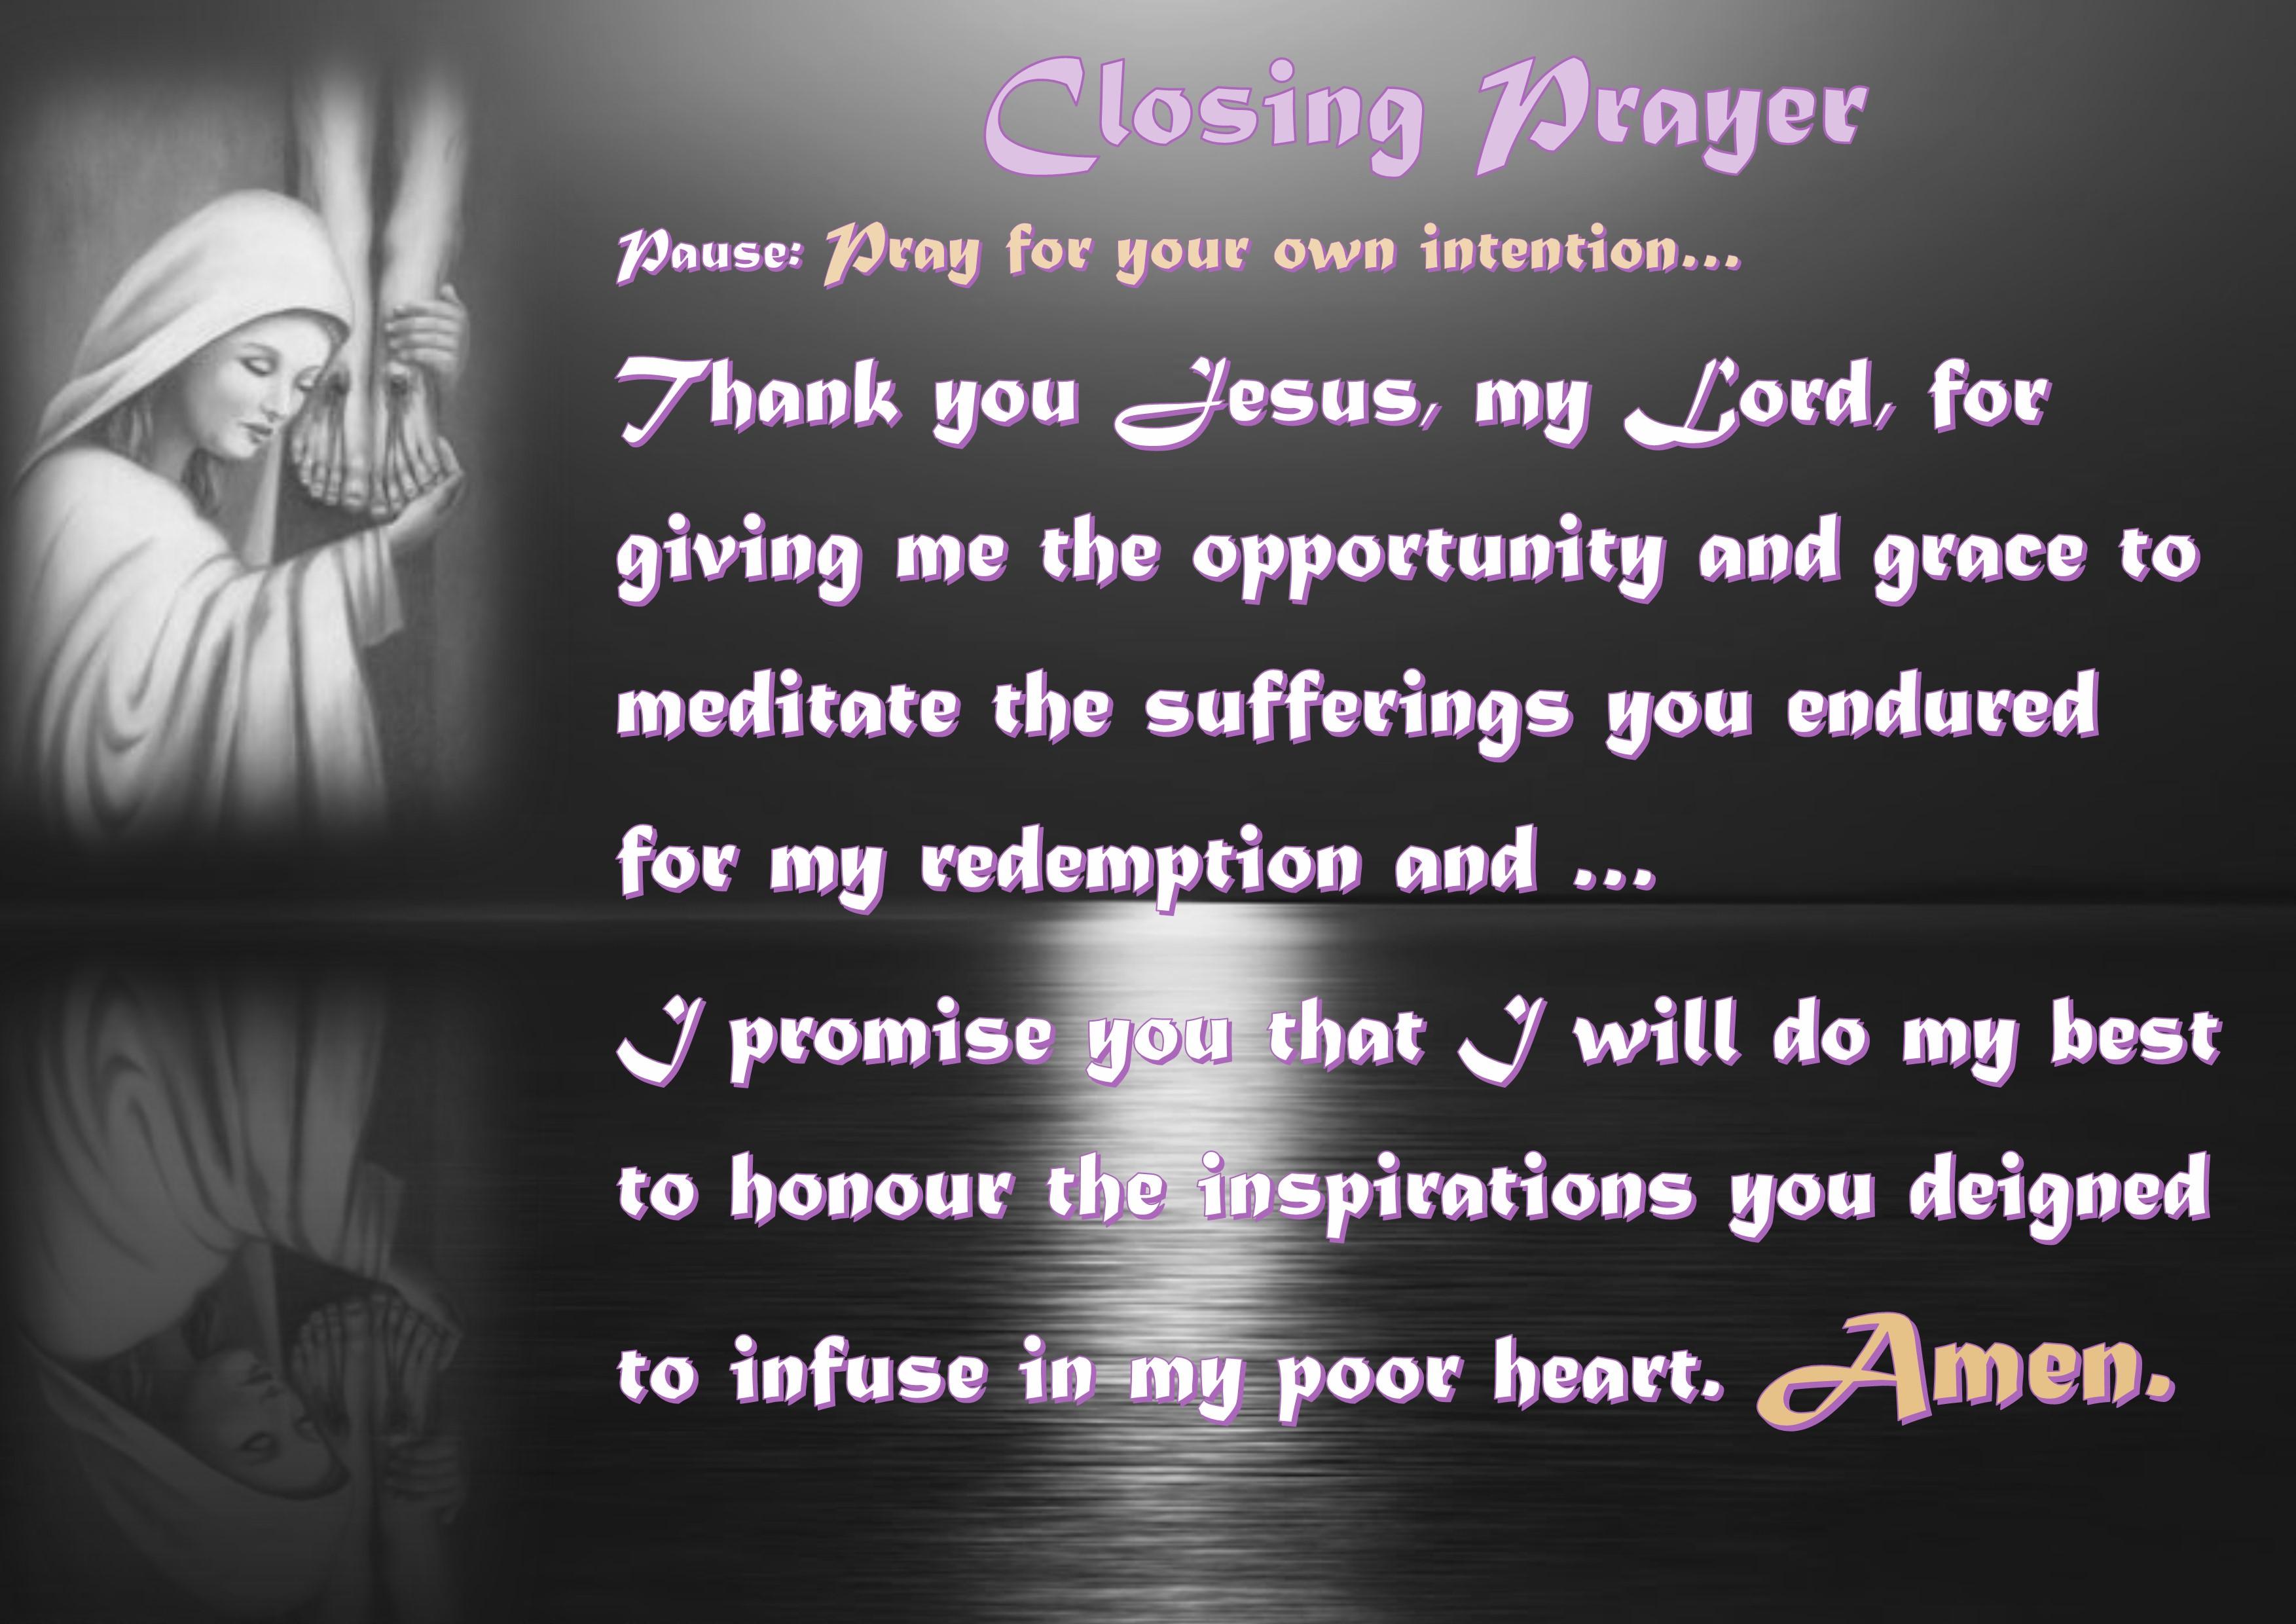 closing prayer on hope